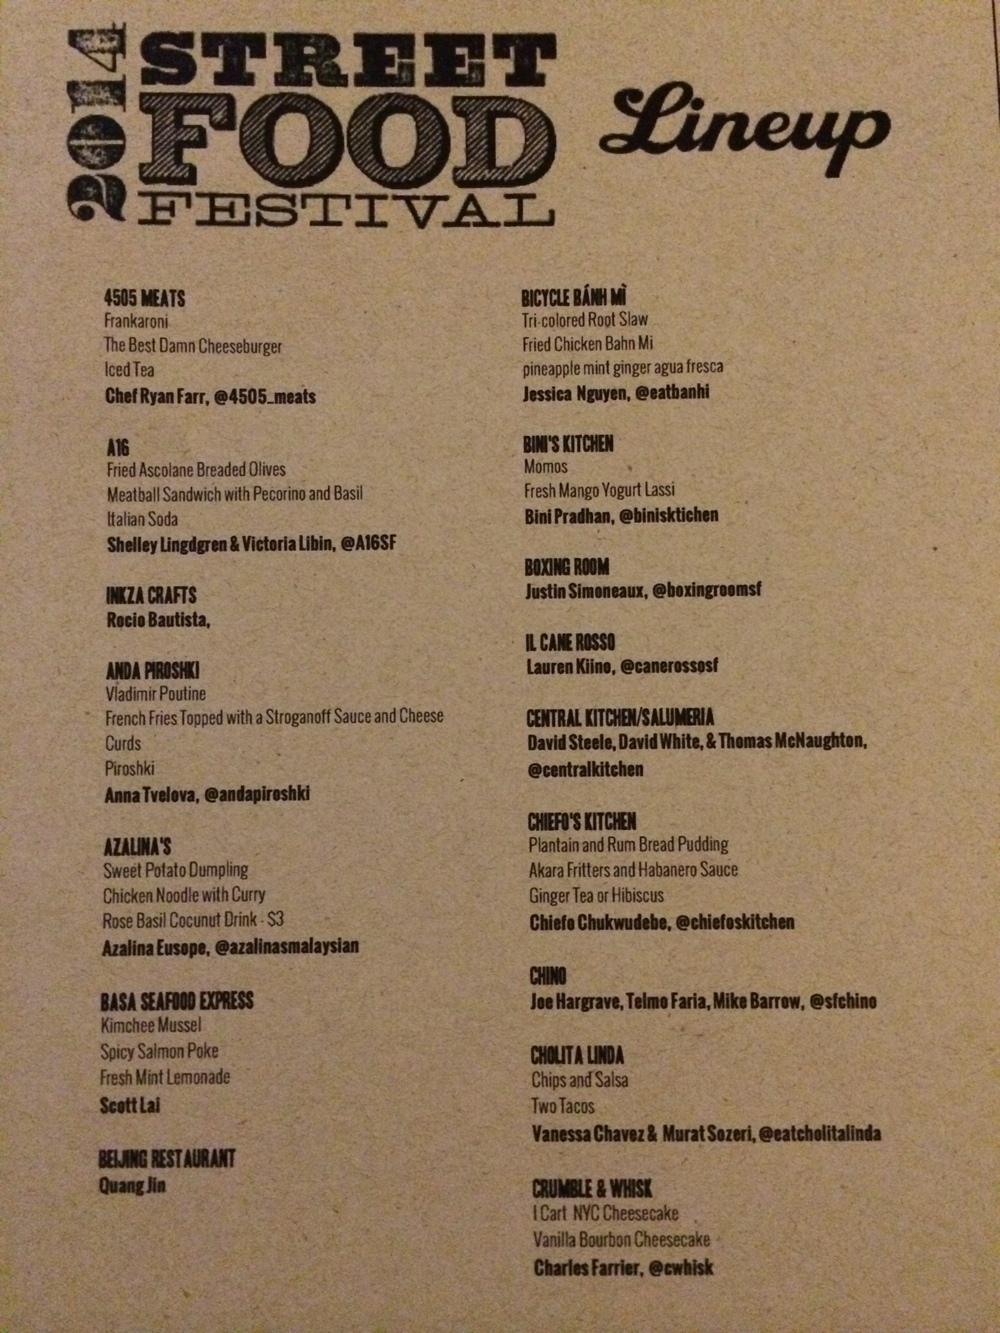 2014 SF Street Food Festival Menu - 1/5